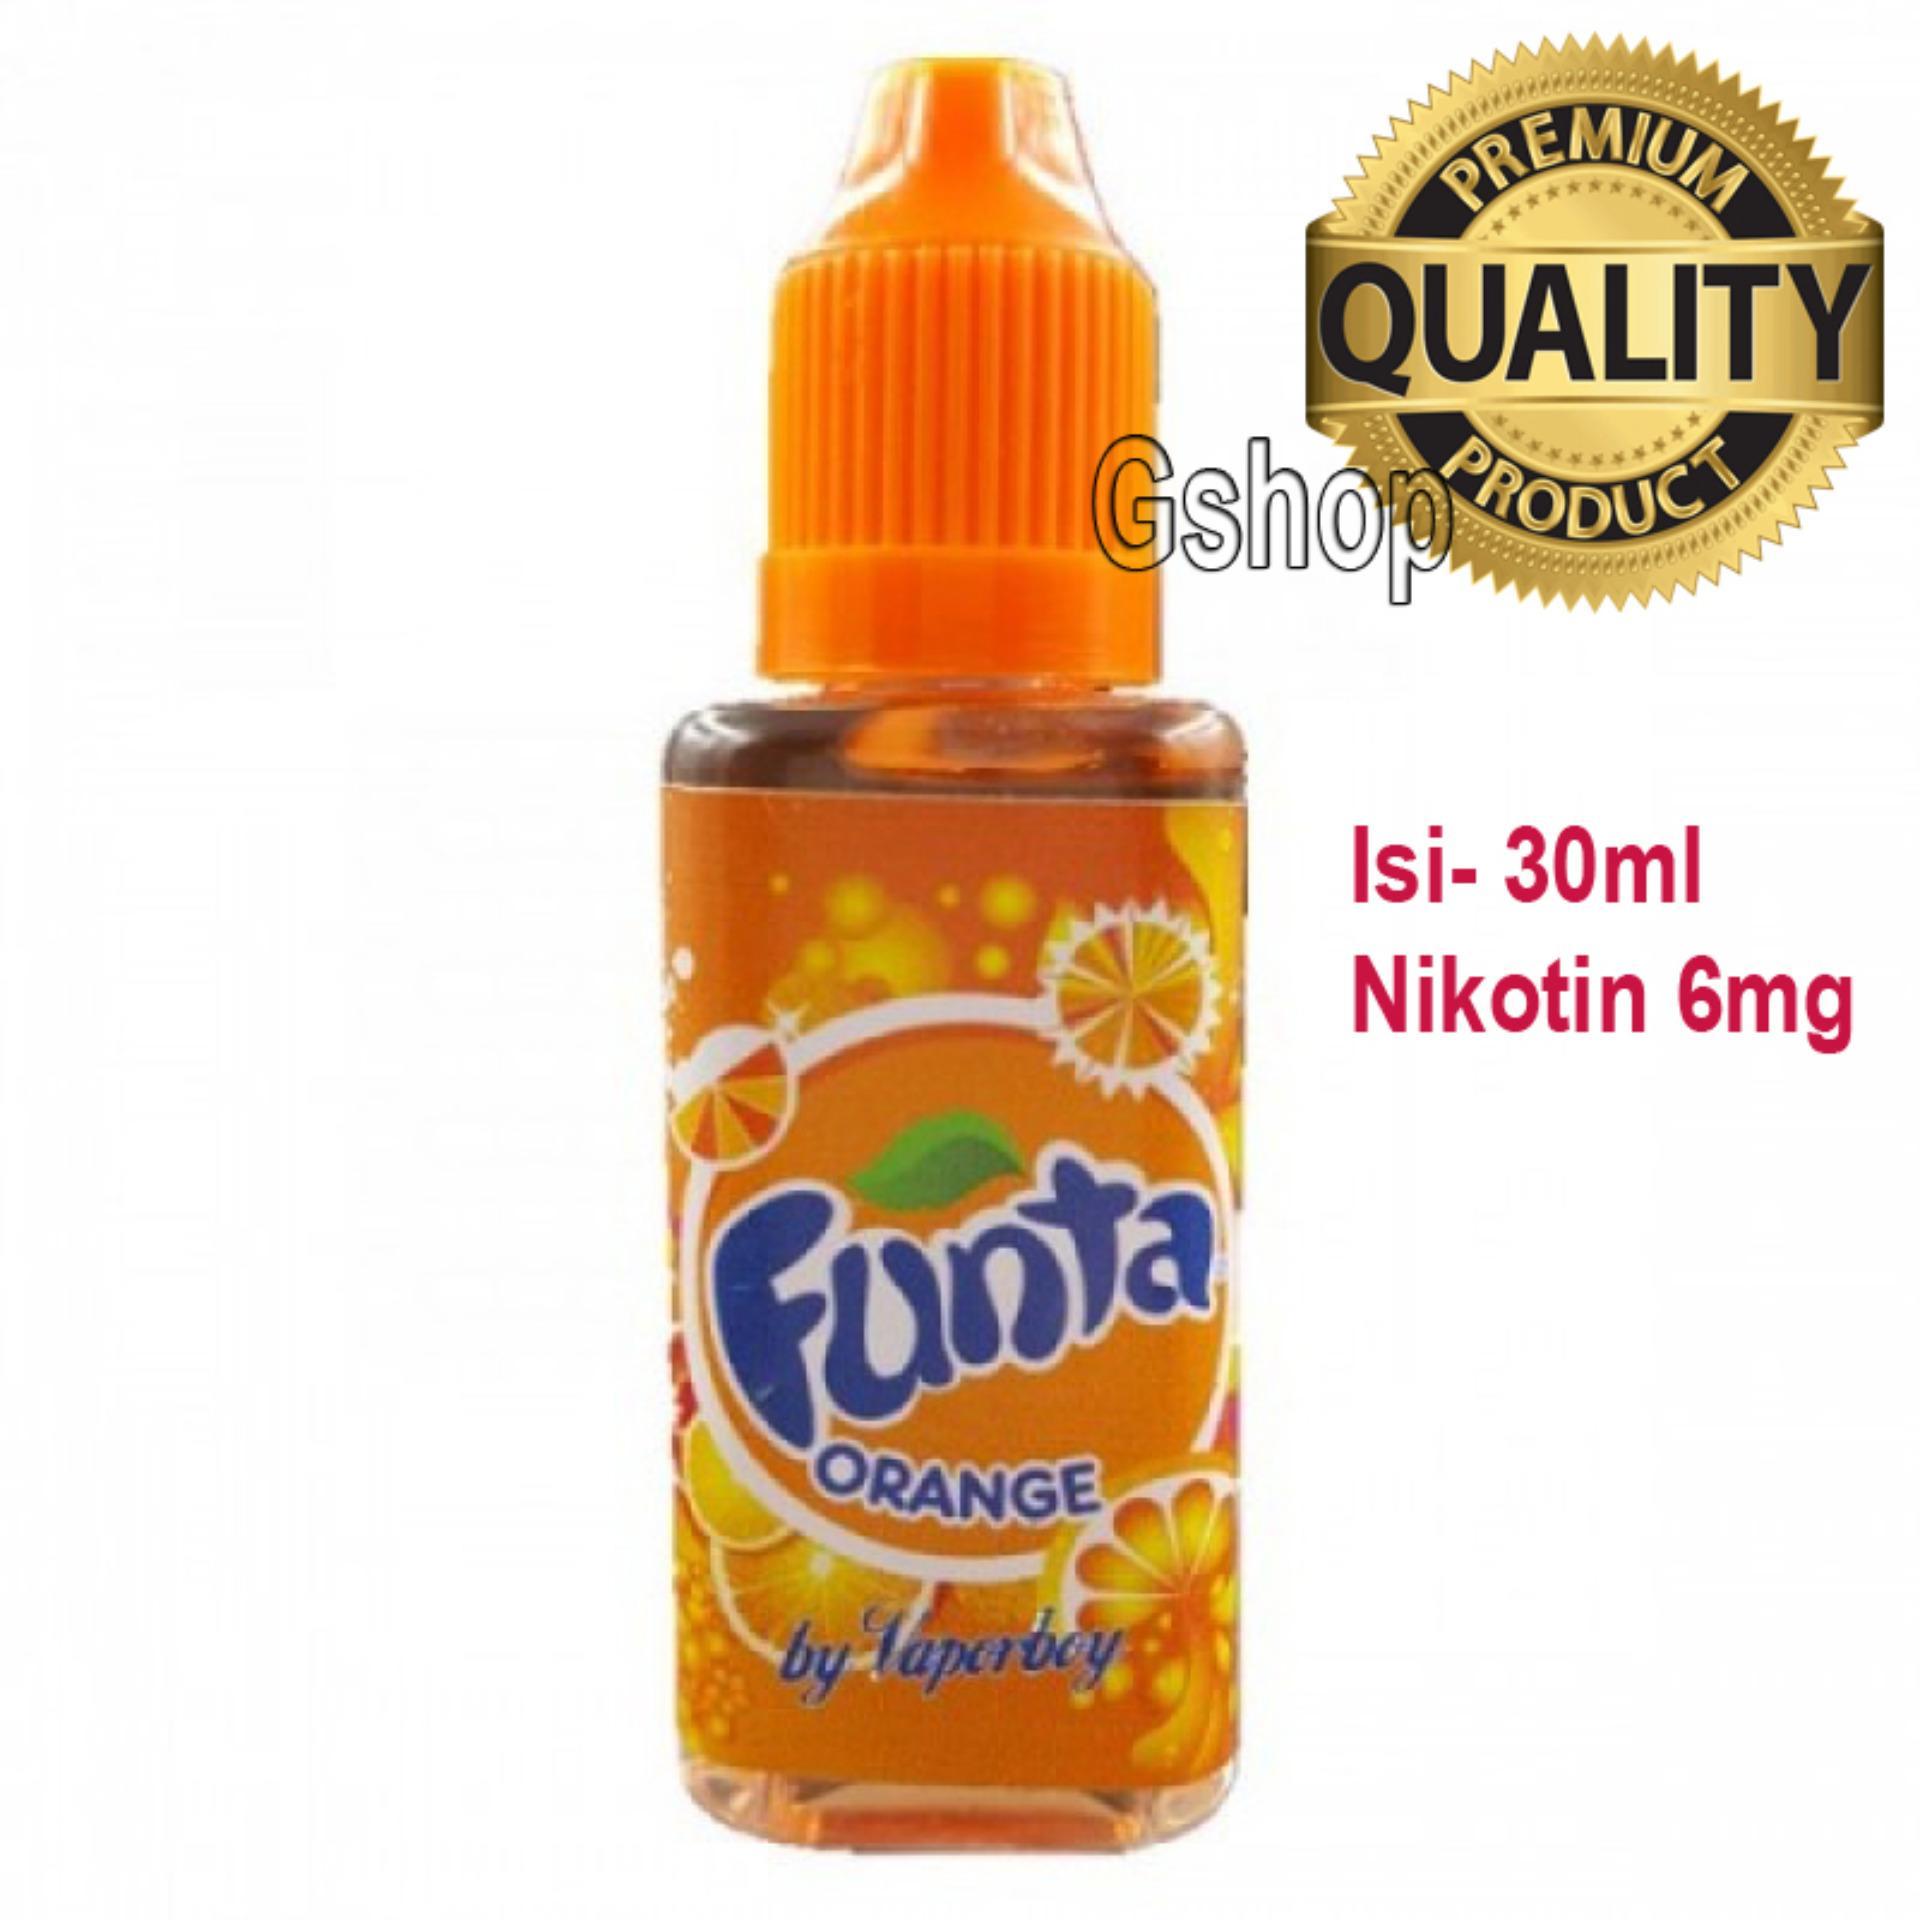 Gshop Premium E-Liquids 30ml By Vapoboy 6mg Nicotine for ElectronicCigarettes